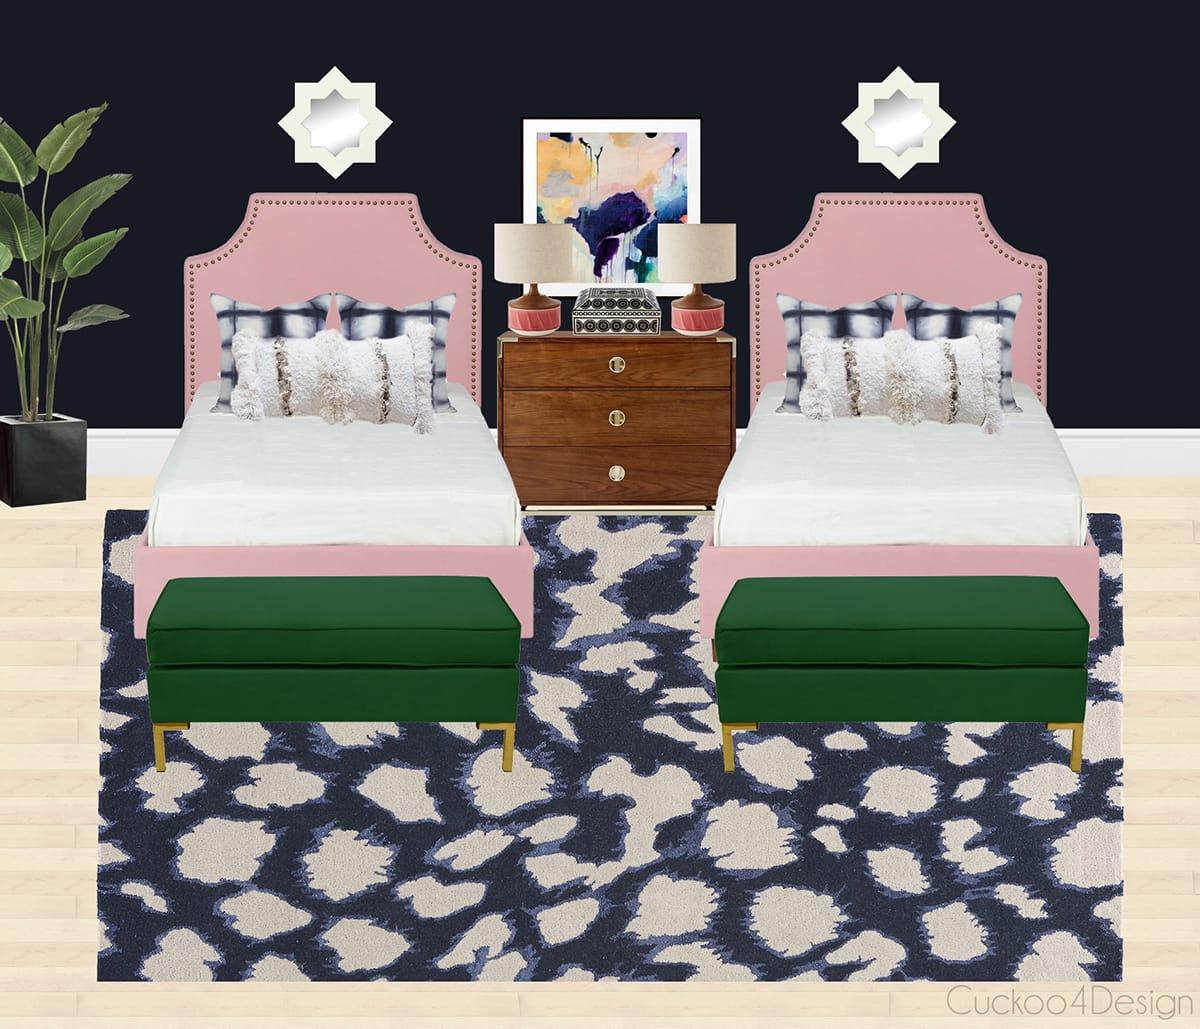 A twin girls' bedroom